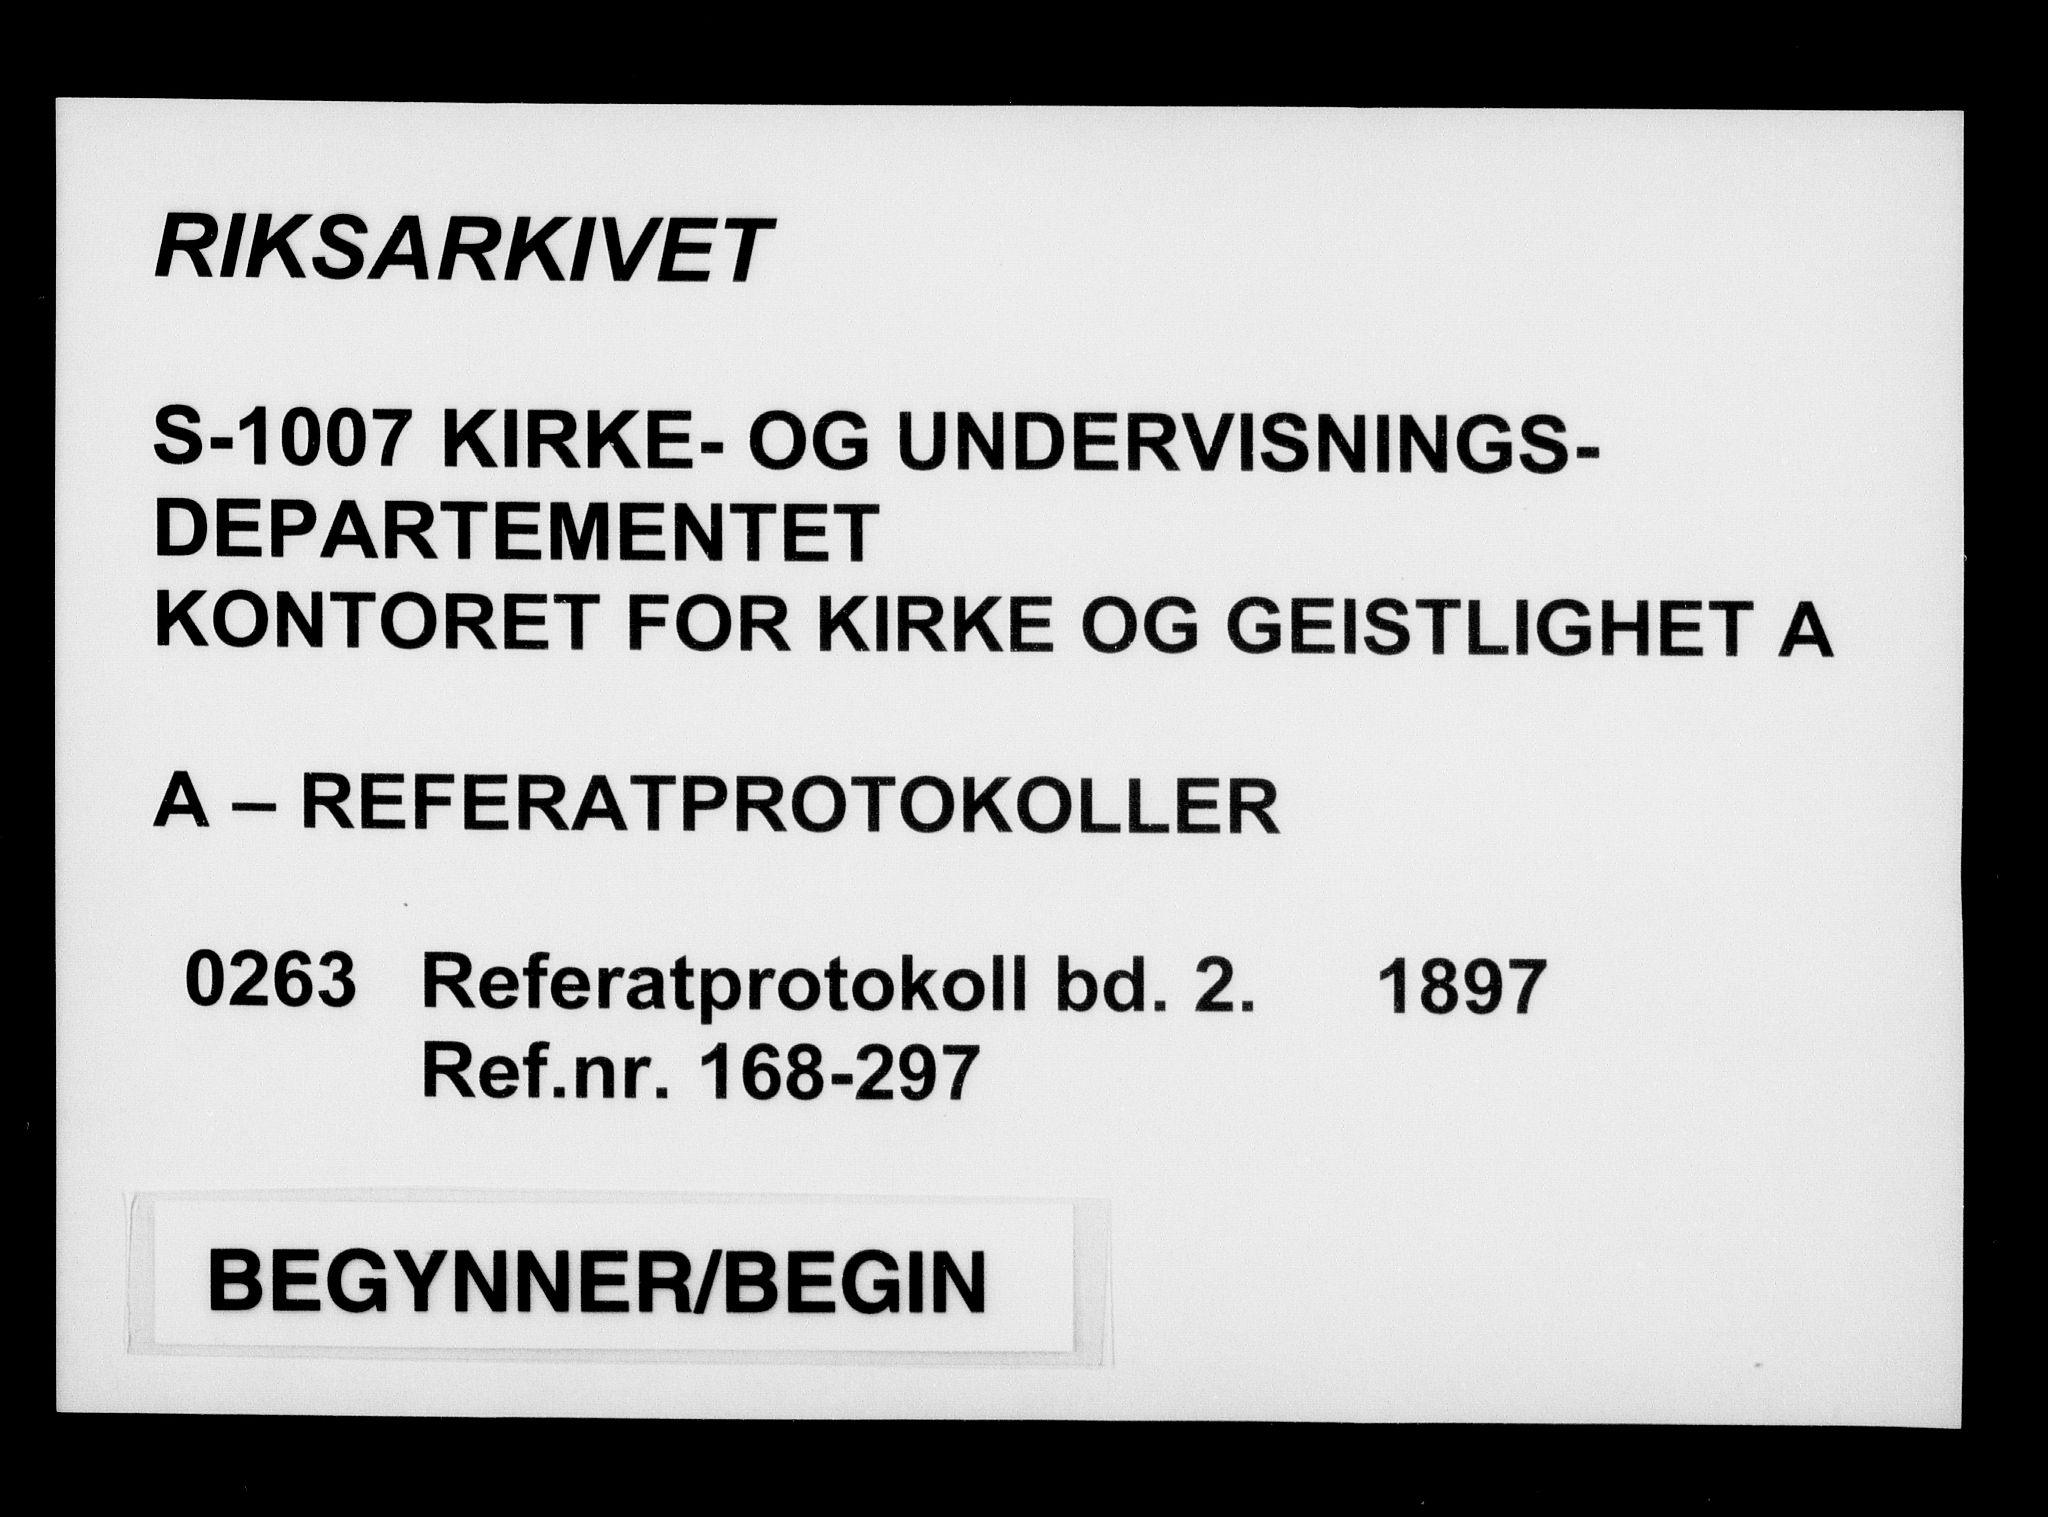 RA, Kirke- og undervisningsdepartementet, Kontoret  for kirke og geistlighet A, A/Aa/L0263: Referatprotokoll bd. 2. Ref.nr. 168-297, 1897